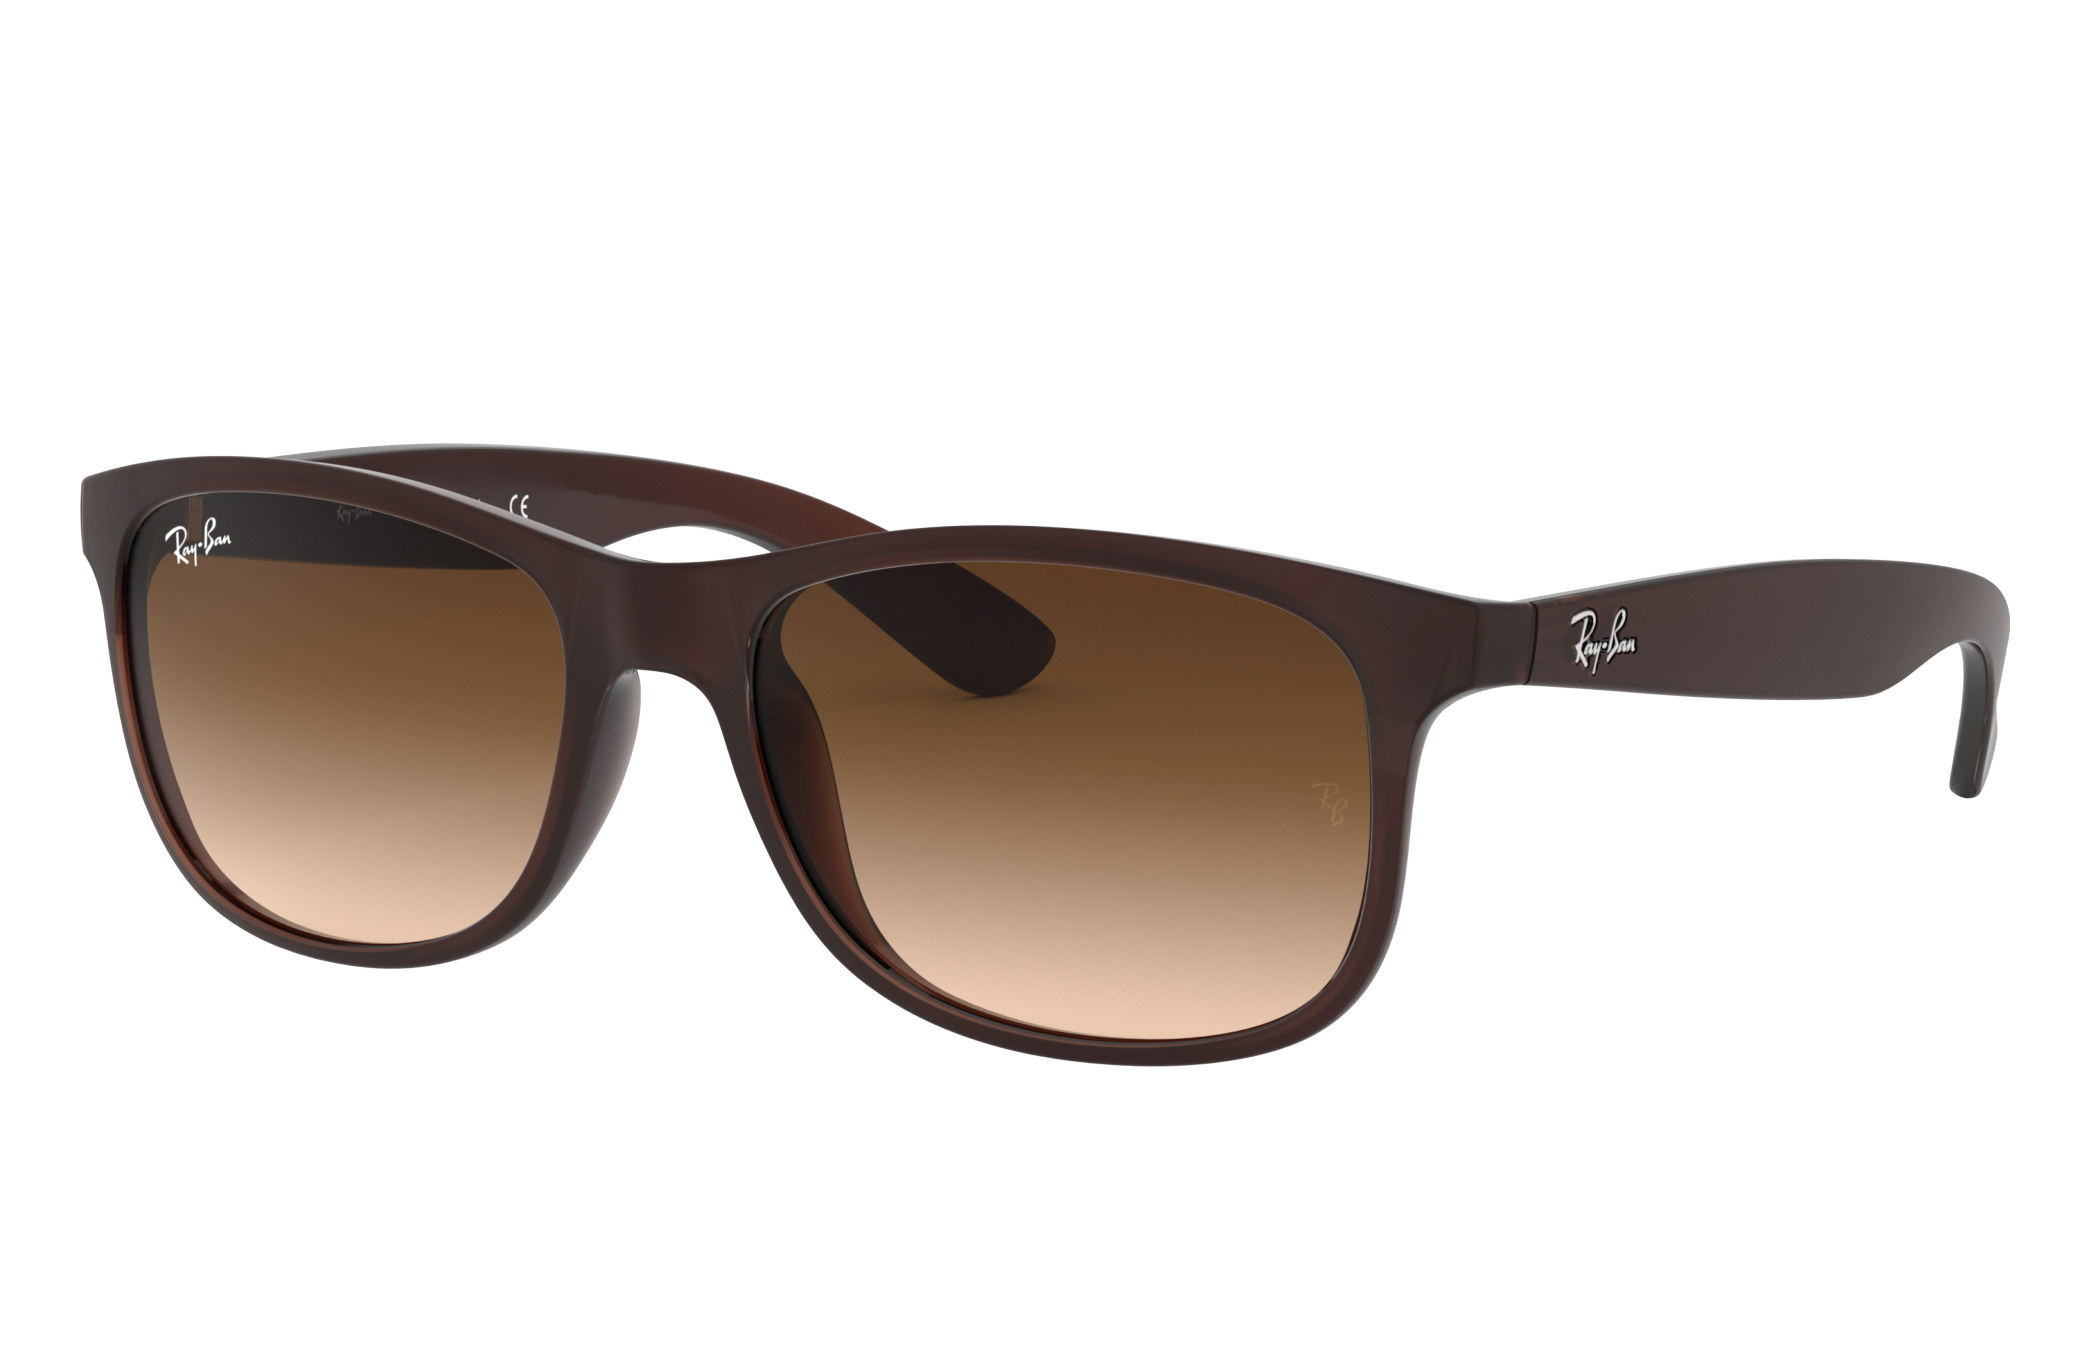 Ray-Ban Andy Brown, Brown Lenses - RB4202